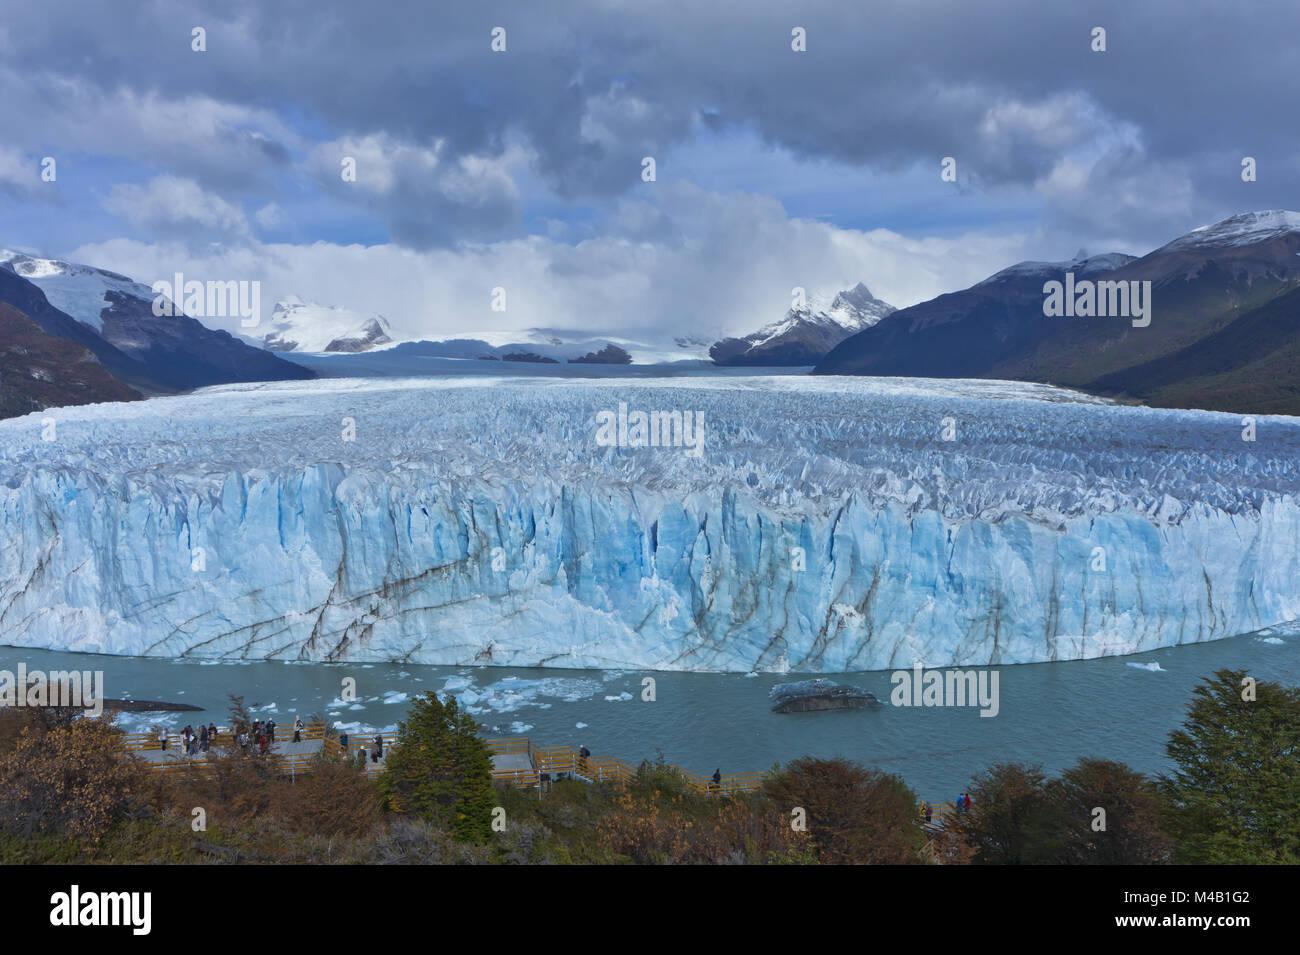 Ghiacciaio blu, Patagonia, Argentina, Sud America Immagini Stock